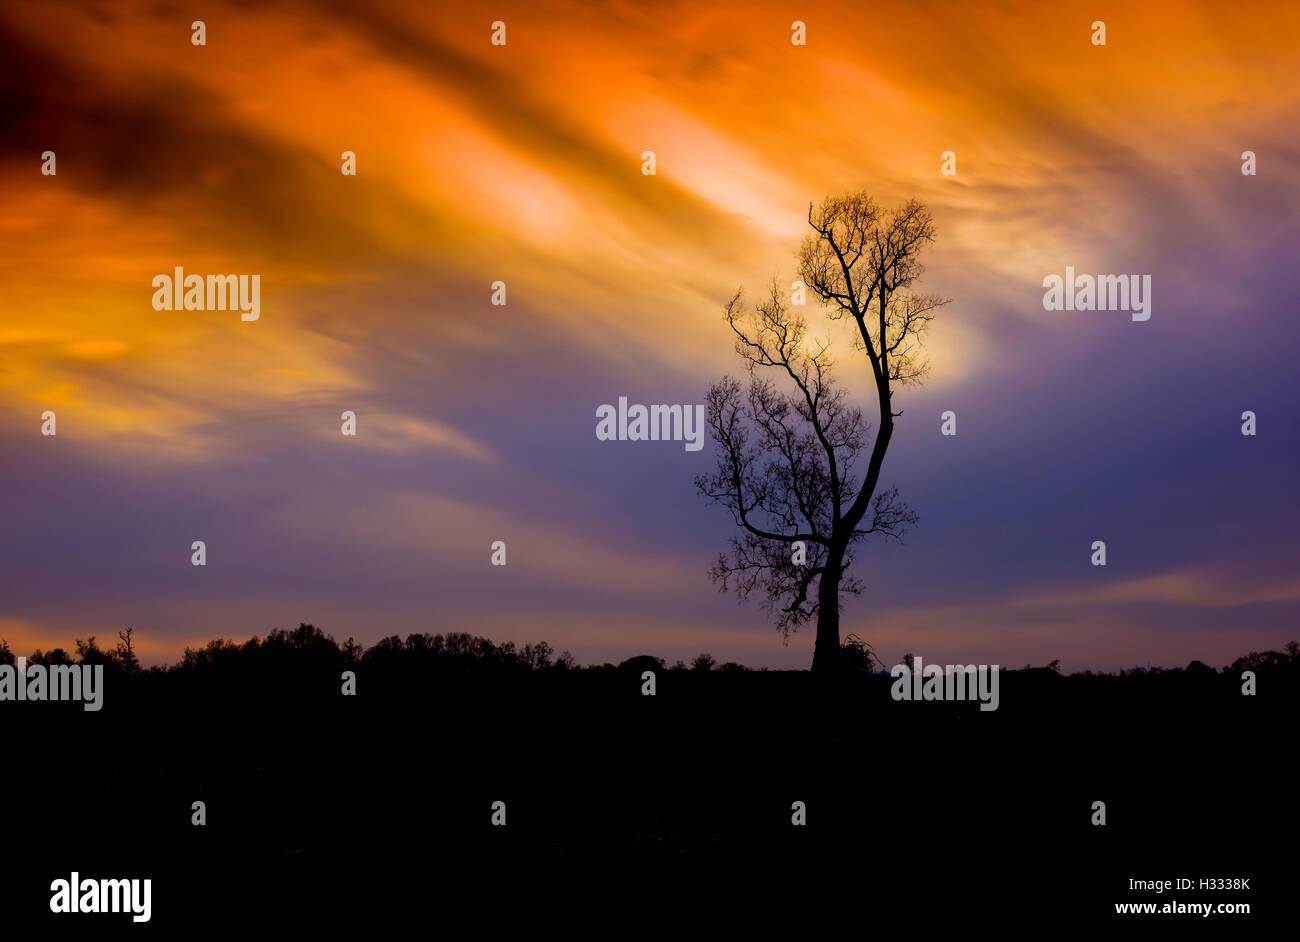 Tree at Sunset, Osorno, The lakes distrit. - Stock Image